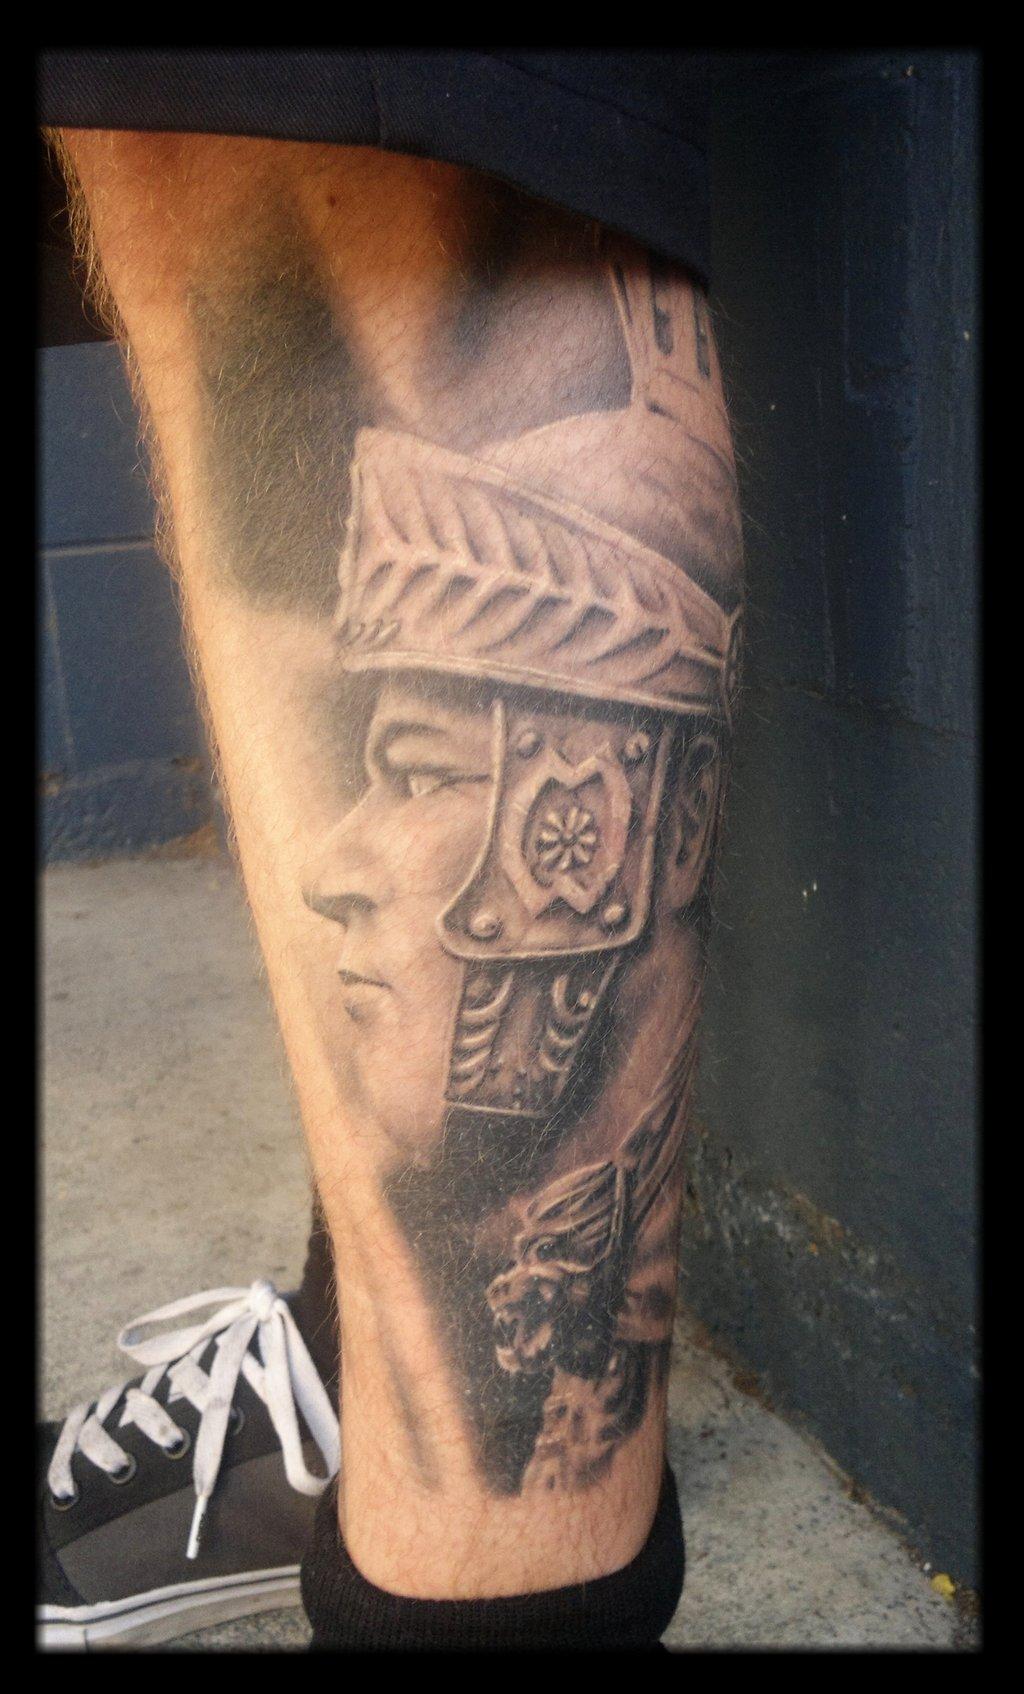 Roman empire tattoos, old english letter b